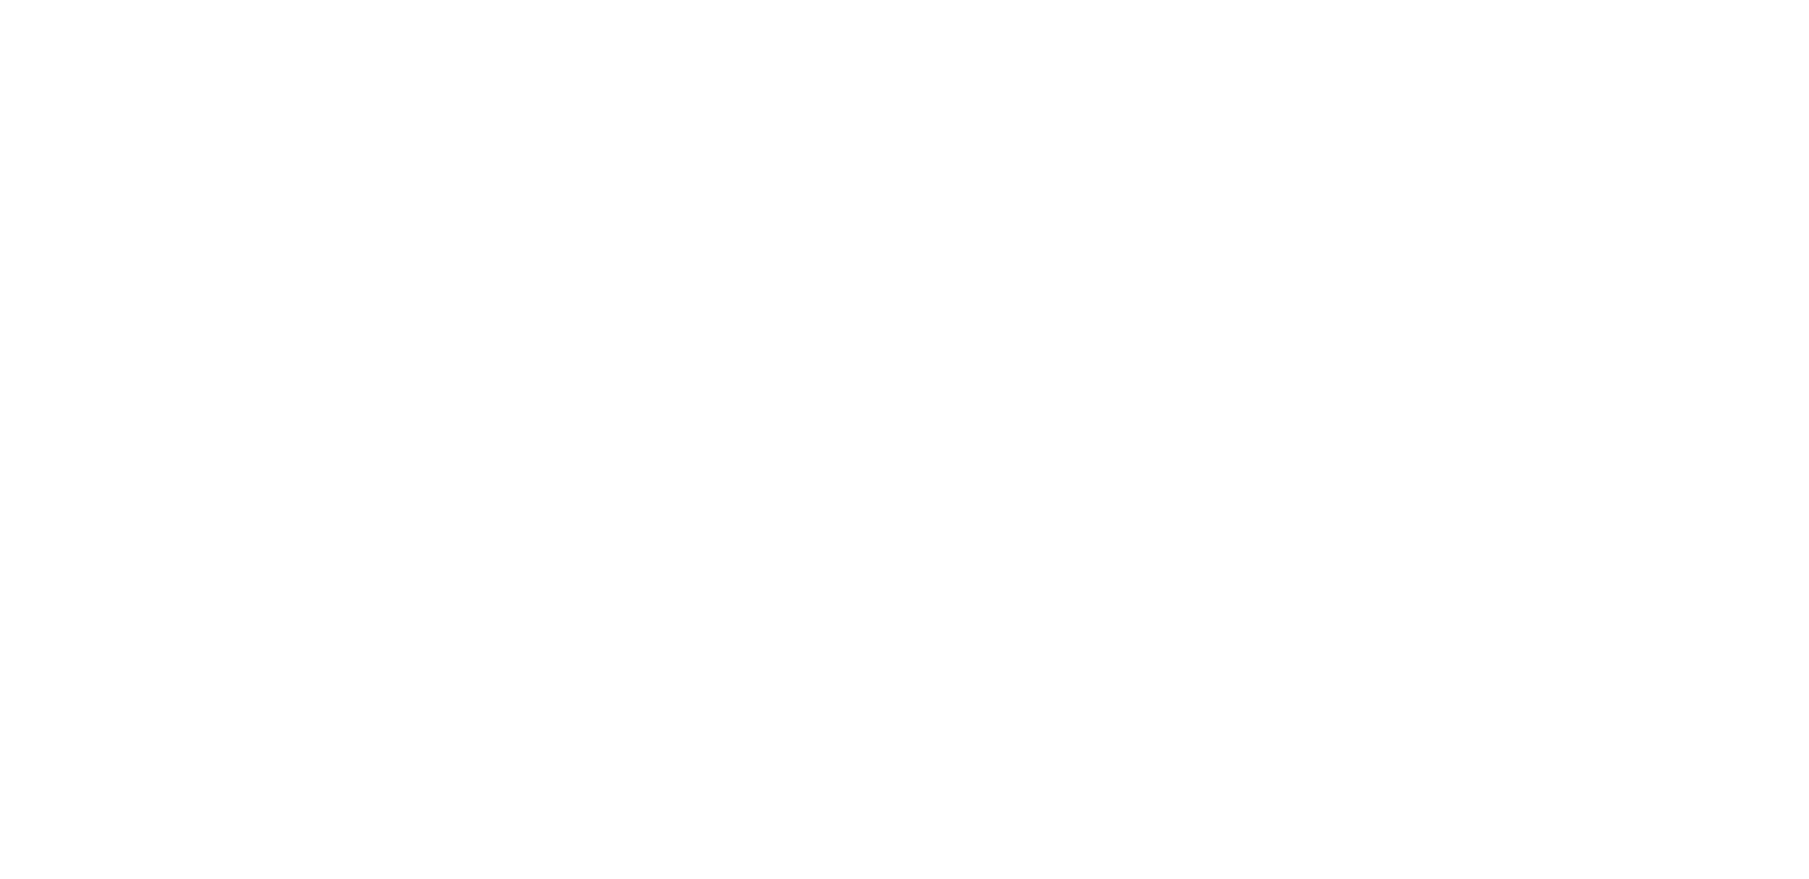 Siriusware logo knockout